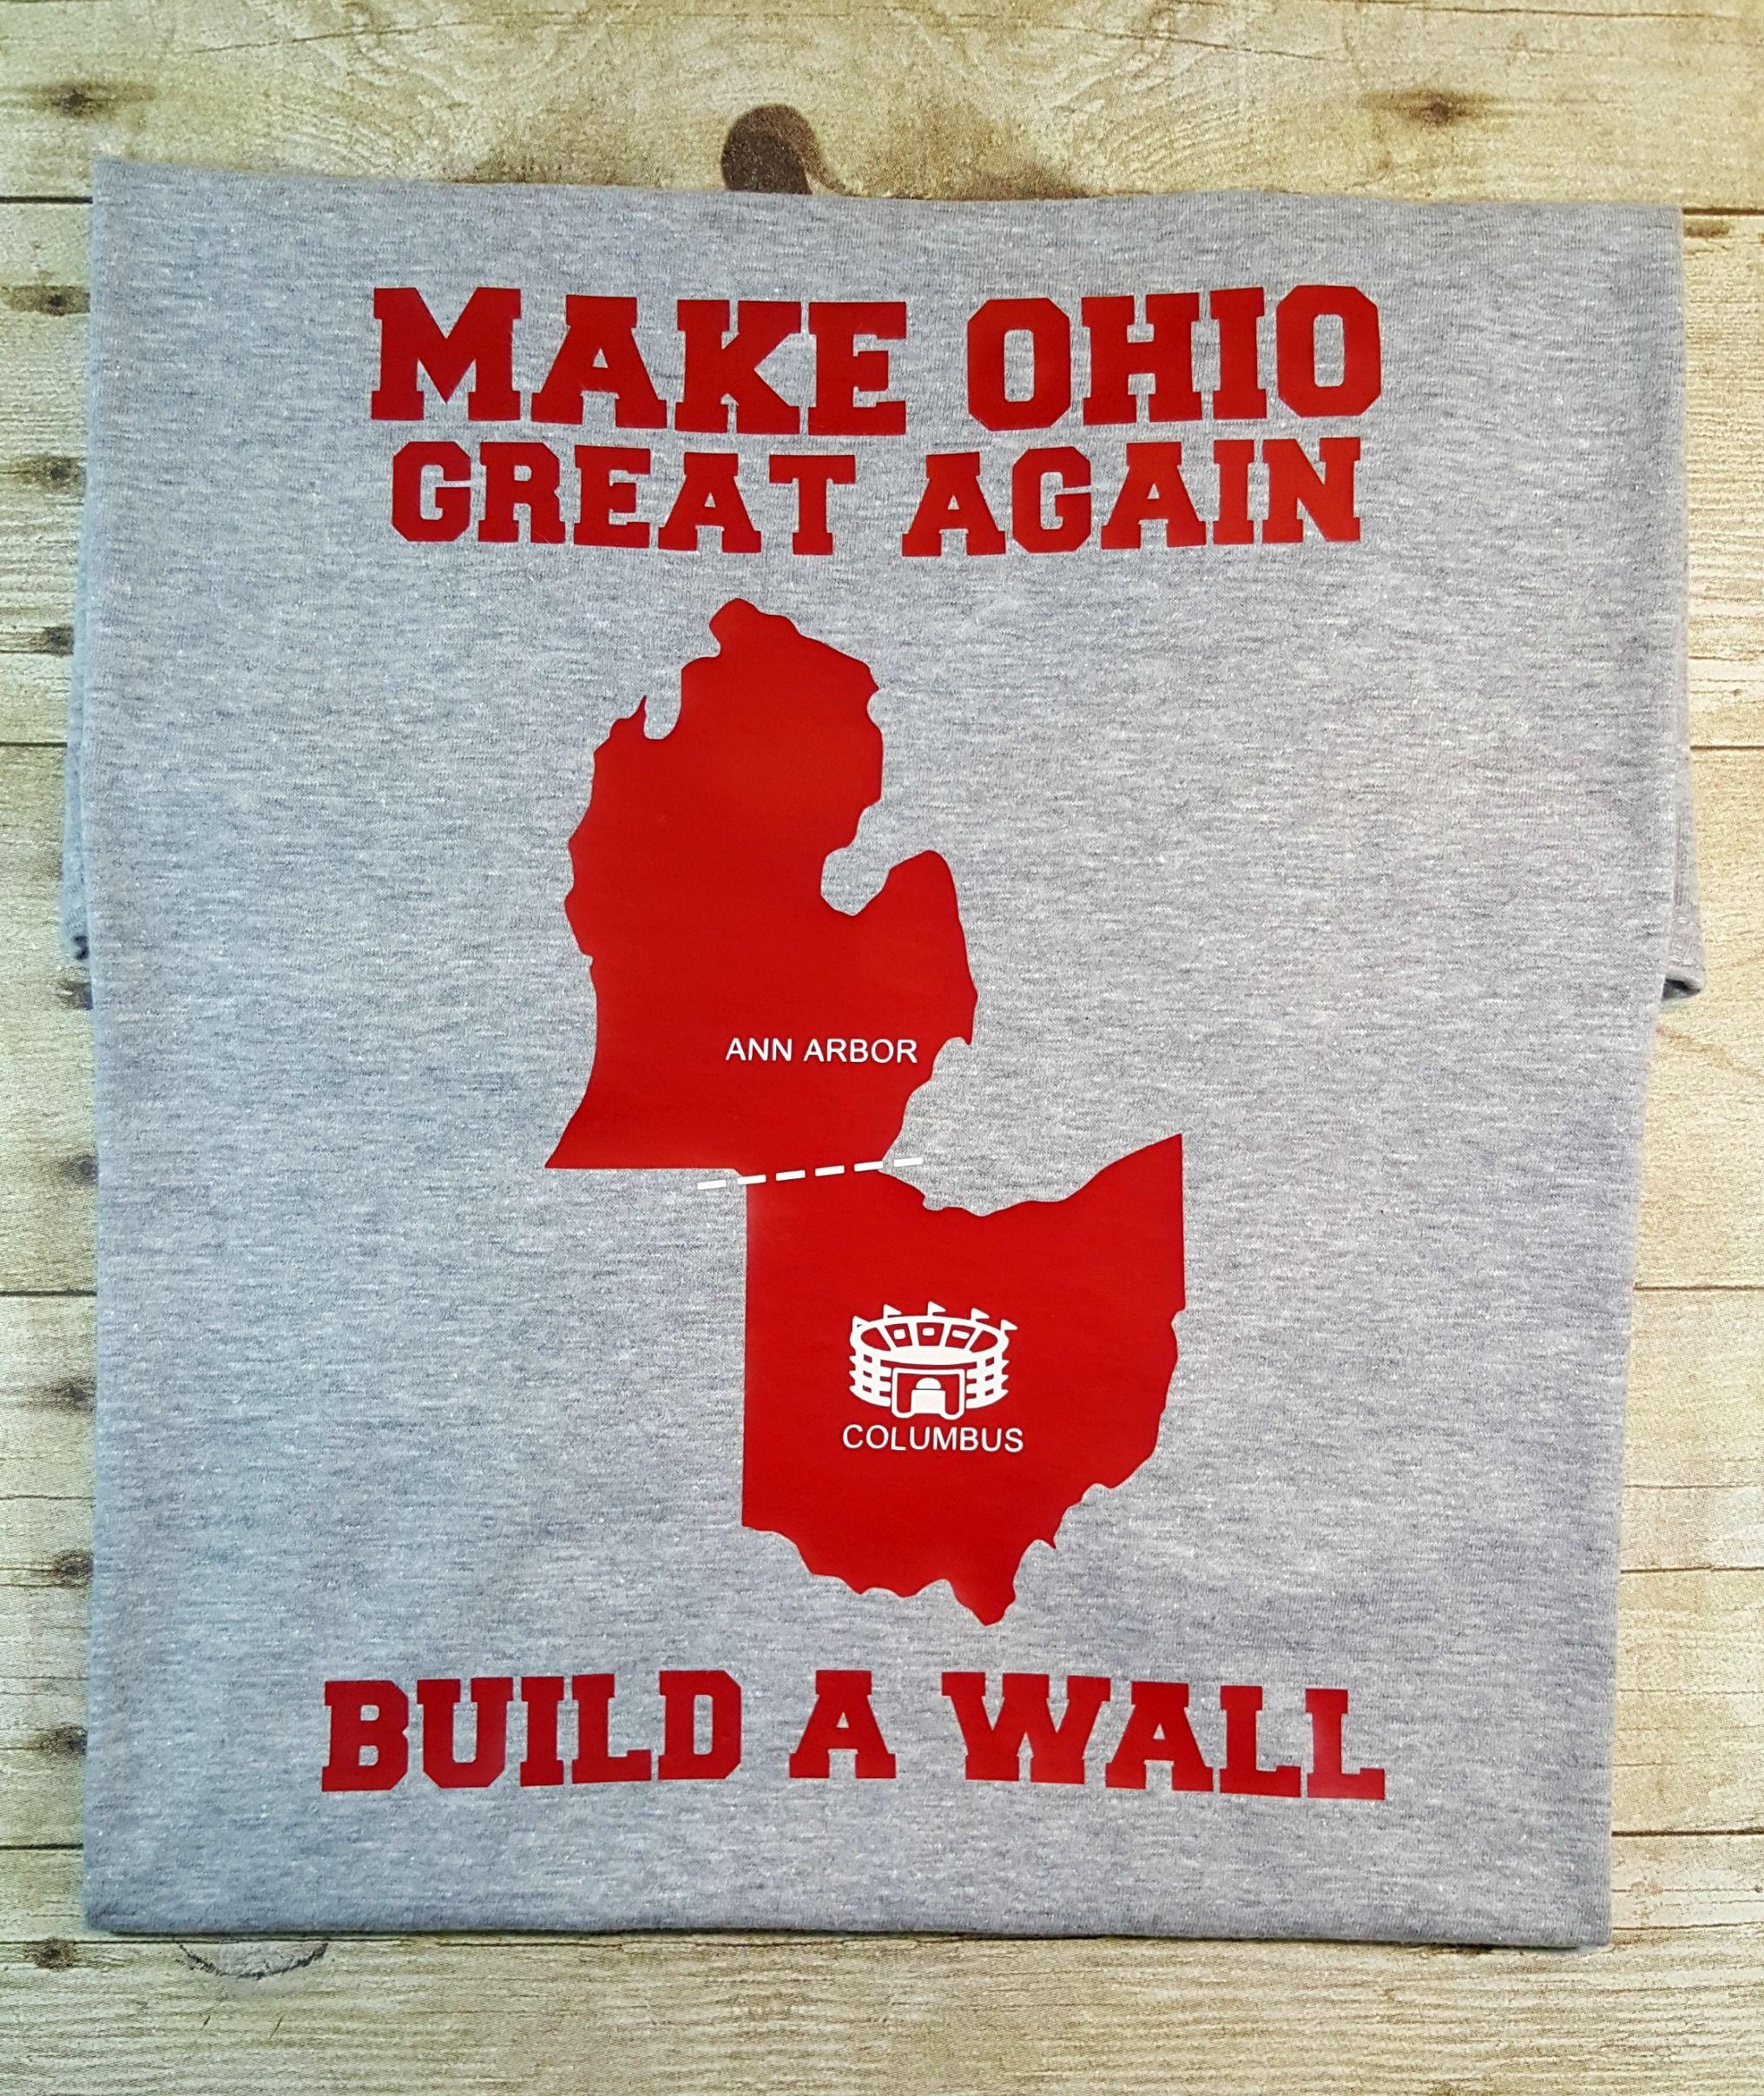 Make Ohio great again- build a wall | Ohio football | Ohio State #ohiostatebuckeyes